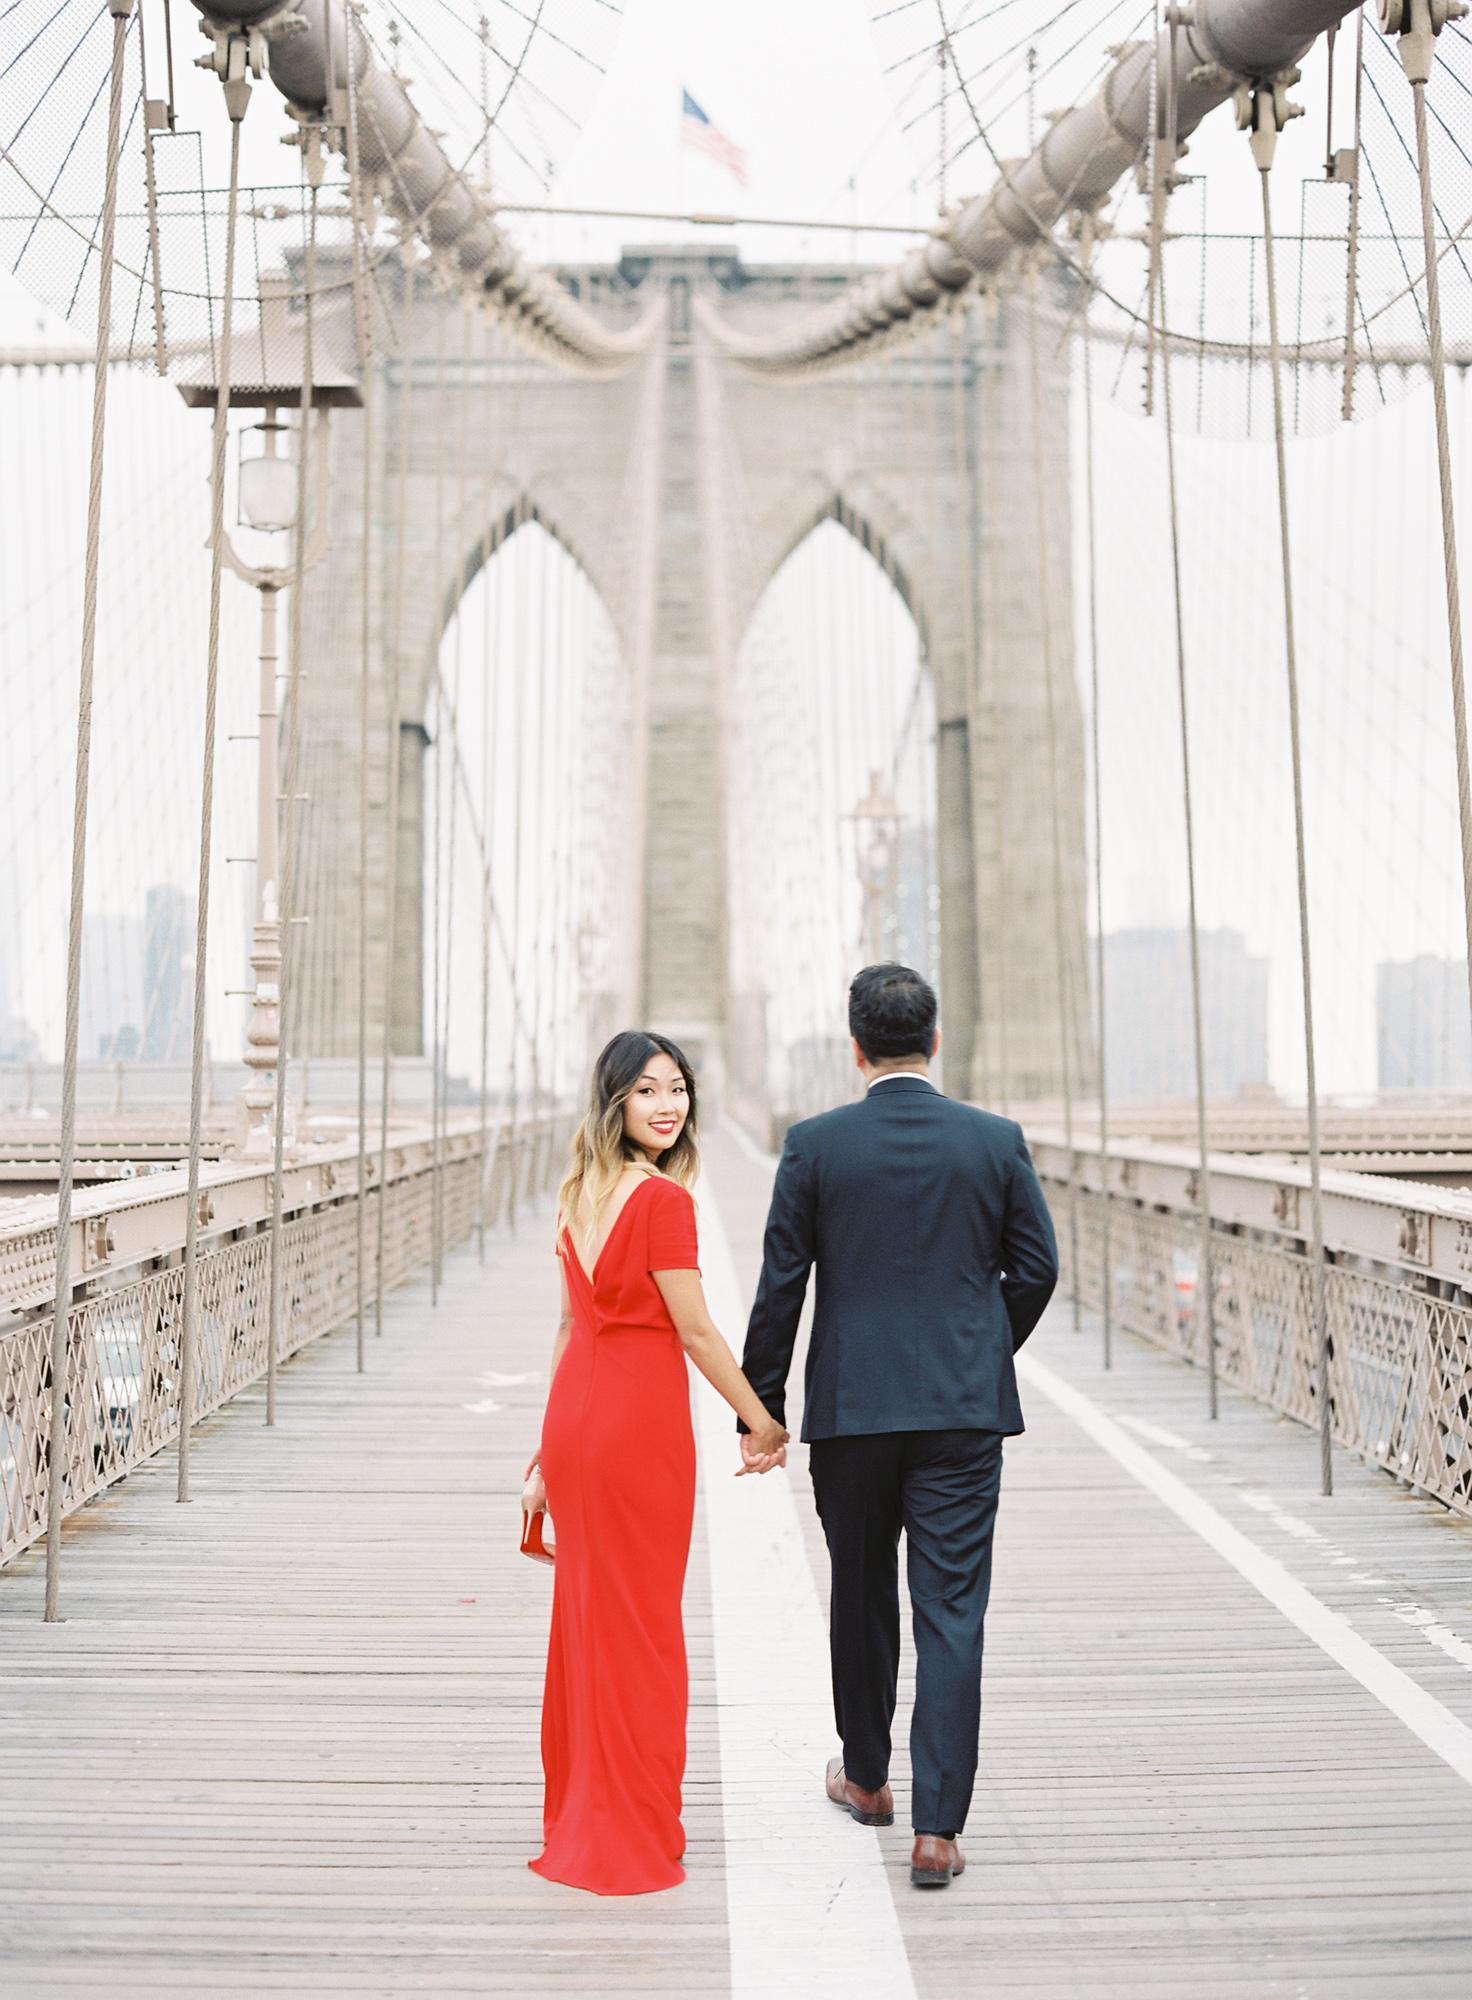 New-York-Film-Engagement-Session-Brooklyn-Bridge-Central-Park-4.jpg